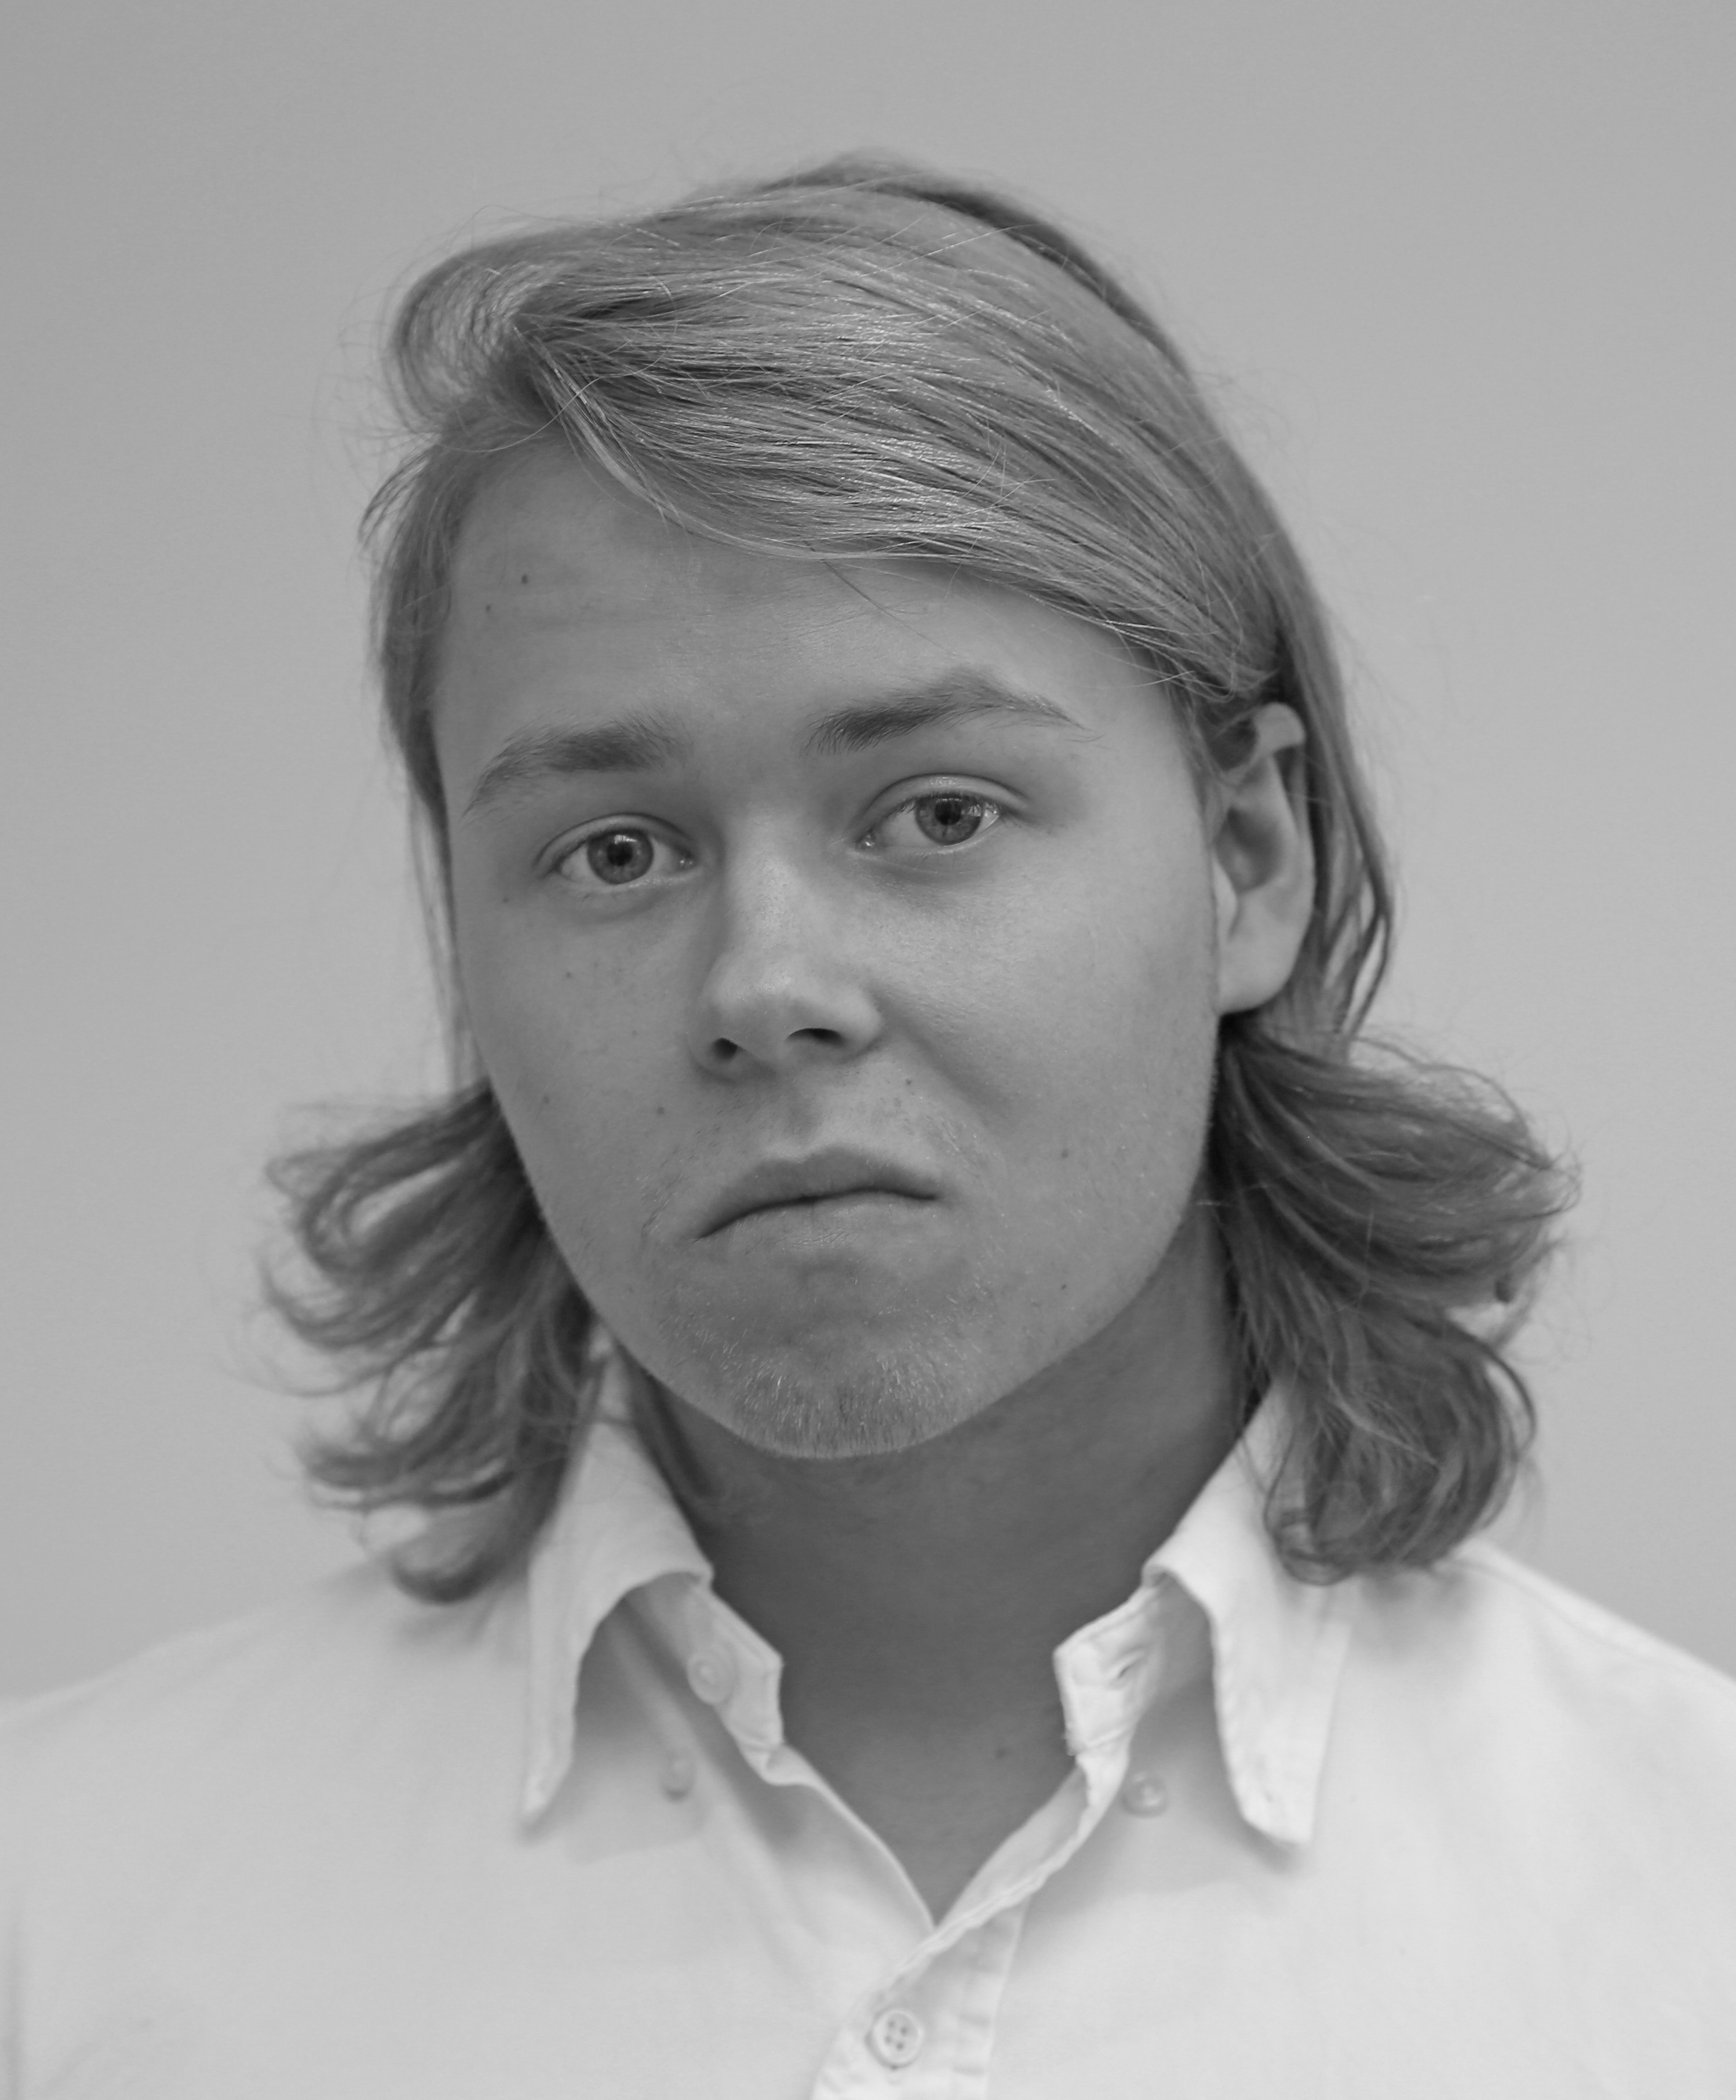 Sander Hellesø